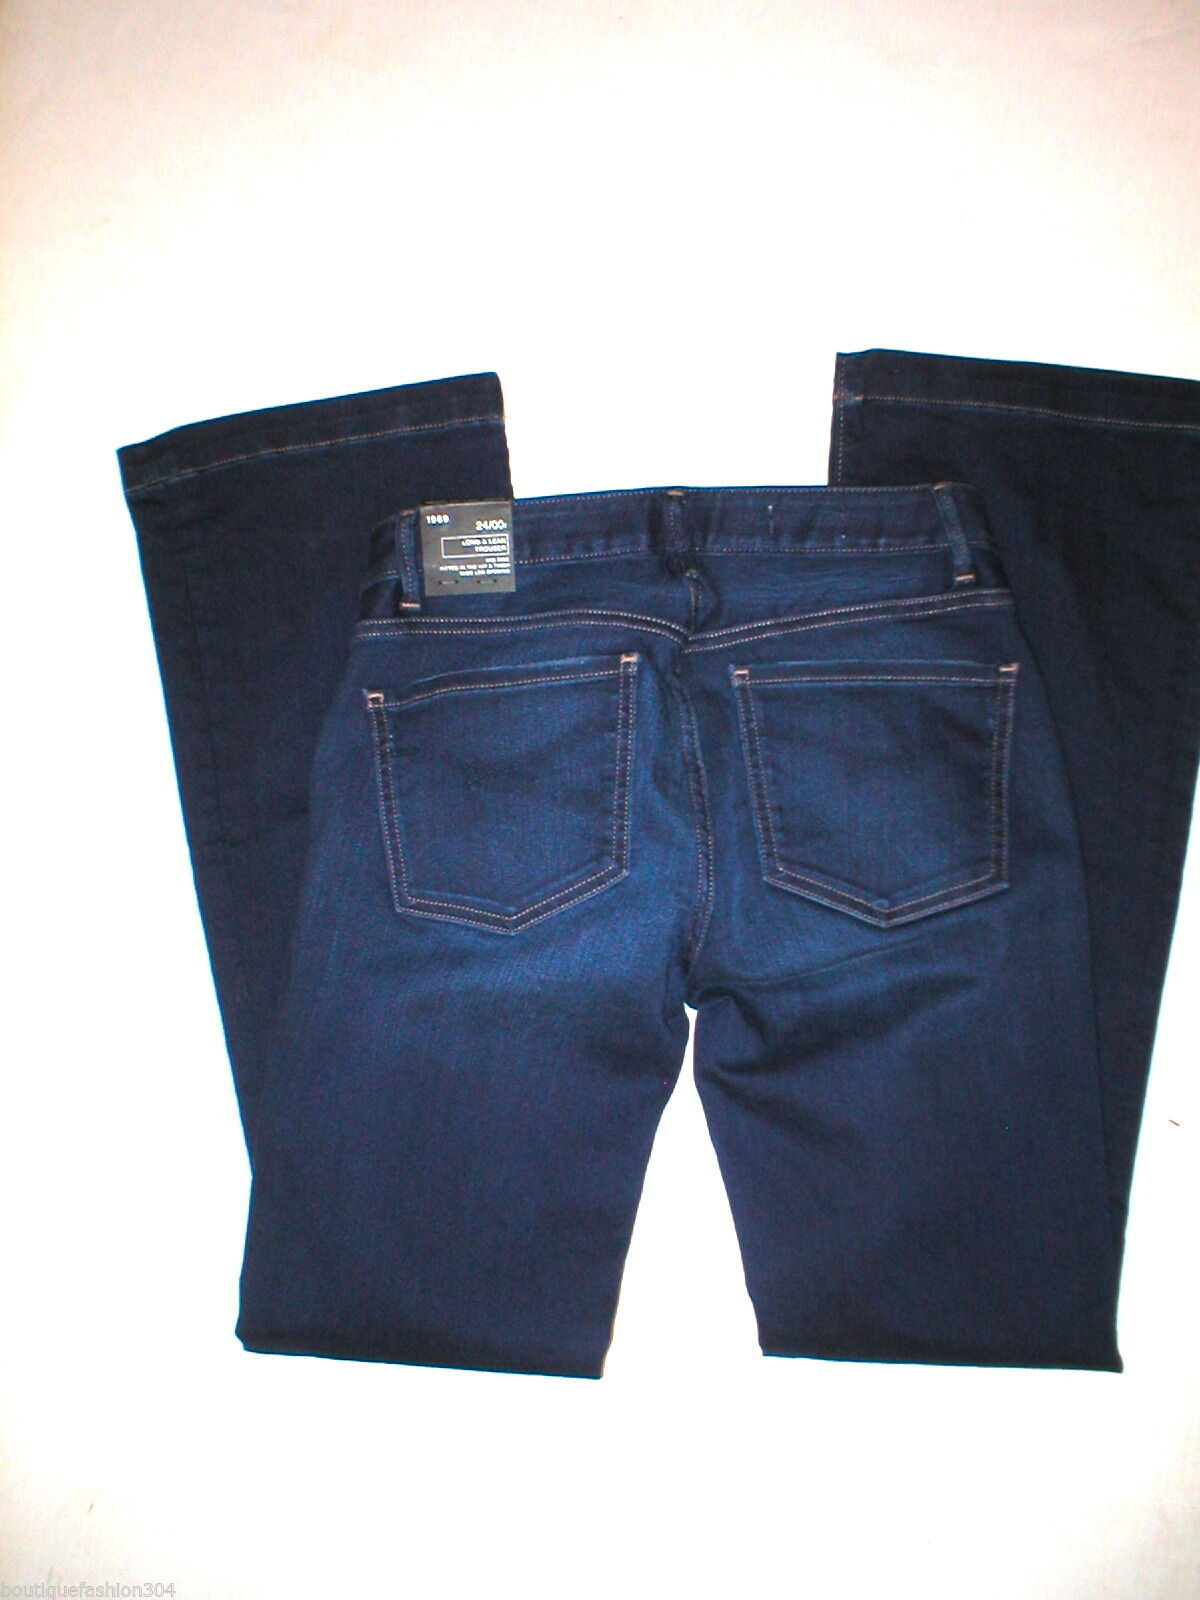 New $70 Womens Gap 1969 Long Lean Jeans NWT 24 00 27 X 32 Flare Premium Mid-rise